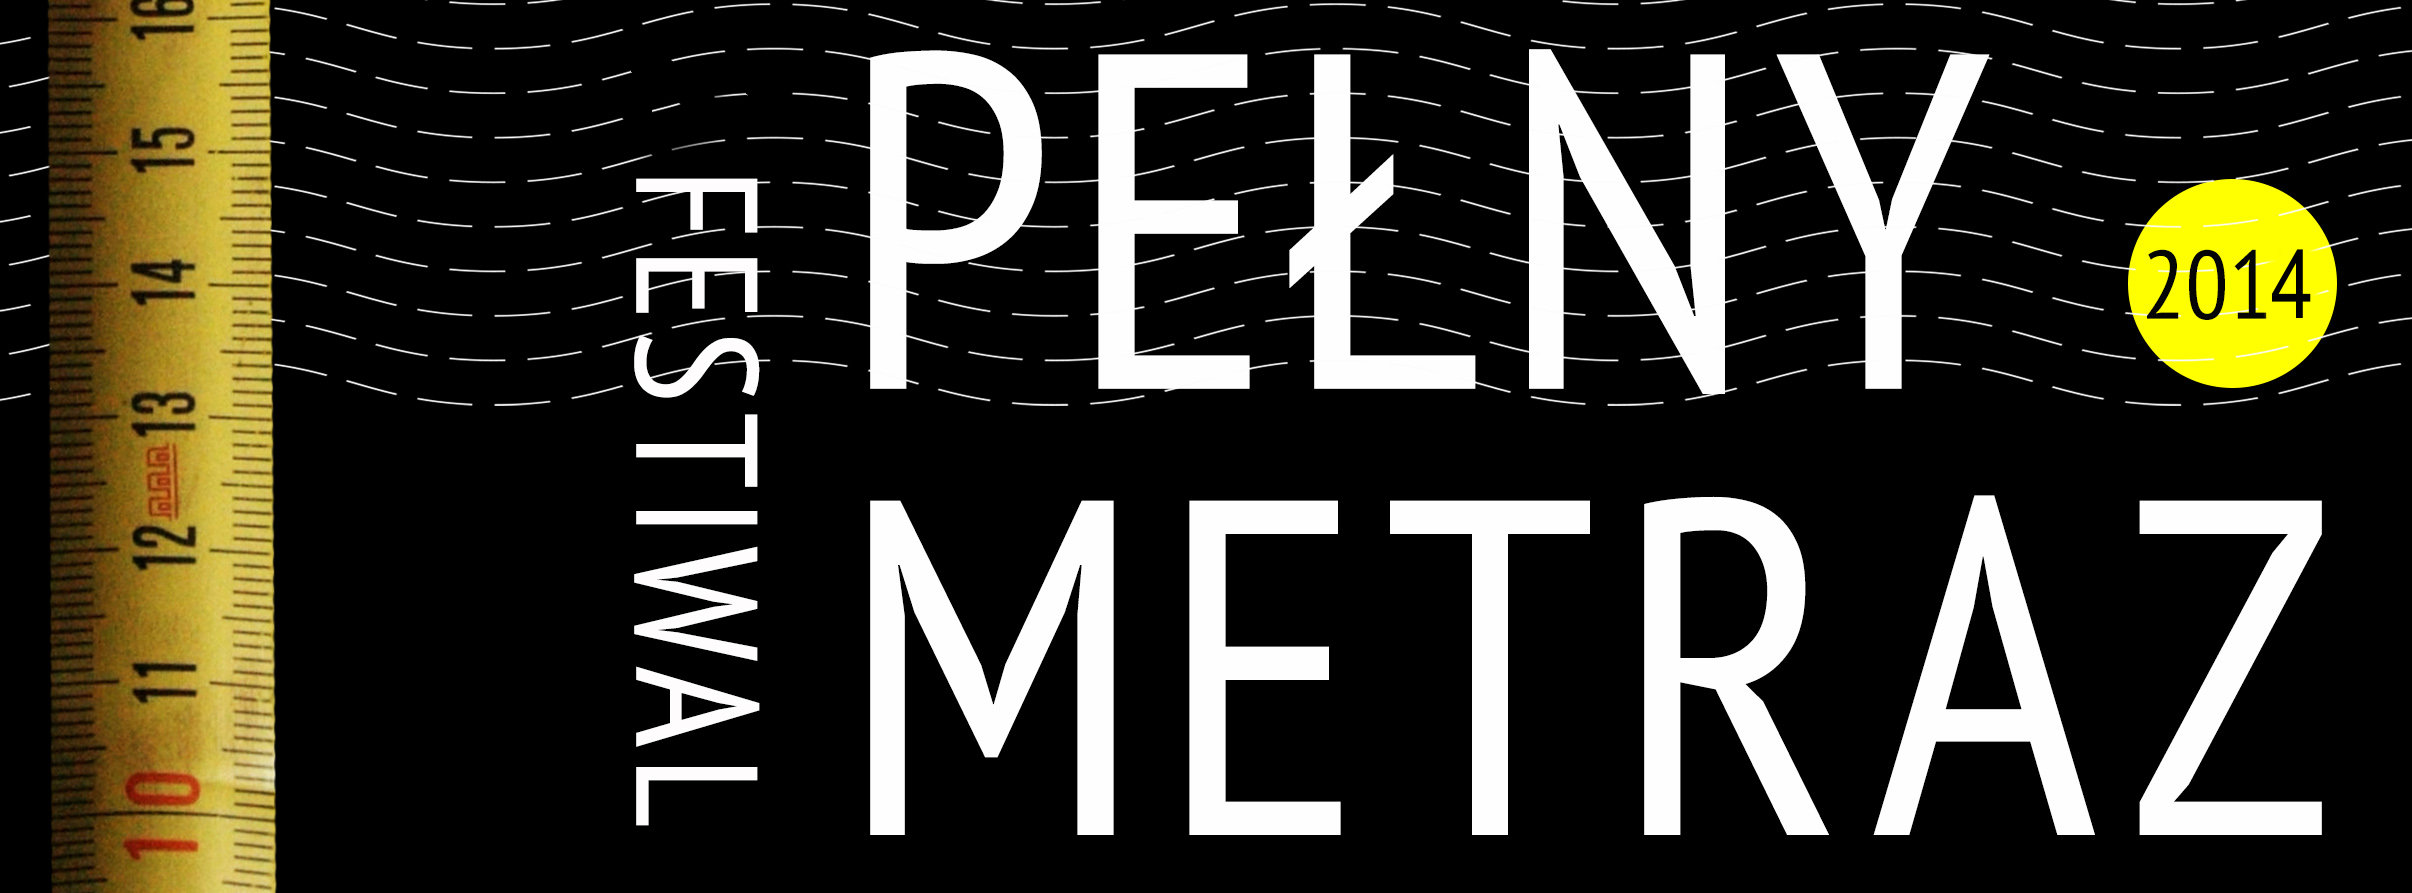 Pełny Metraż 2014, Kinoteatr Projekt, Centrum Kultury, Lublin (źródło: materiały organizatora)